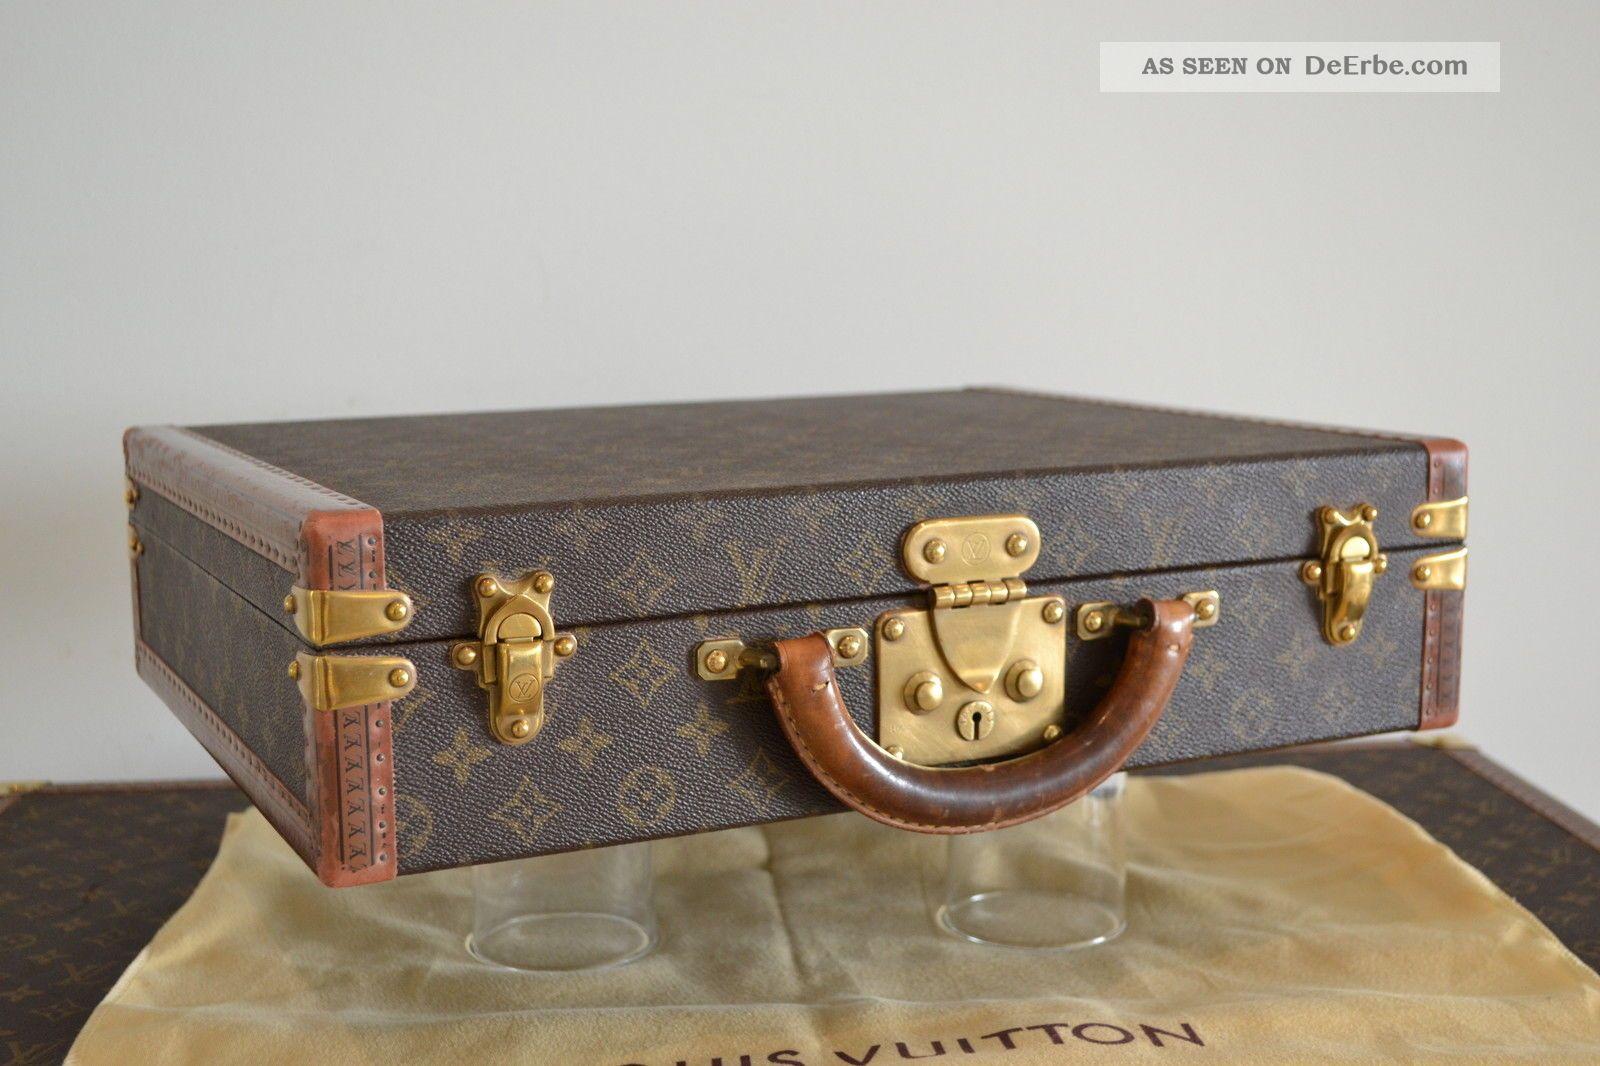 louis vuitton aktenkoffer pr sident classeur monogram canvas m53012 lv. Black Bedroom Furniture Sets. Home Design Ideas